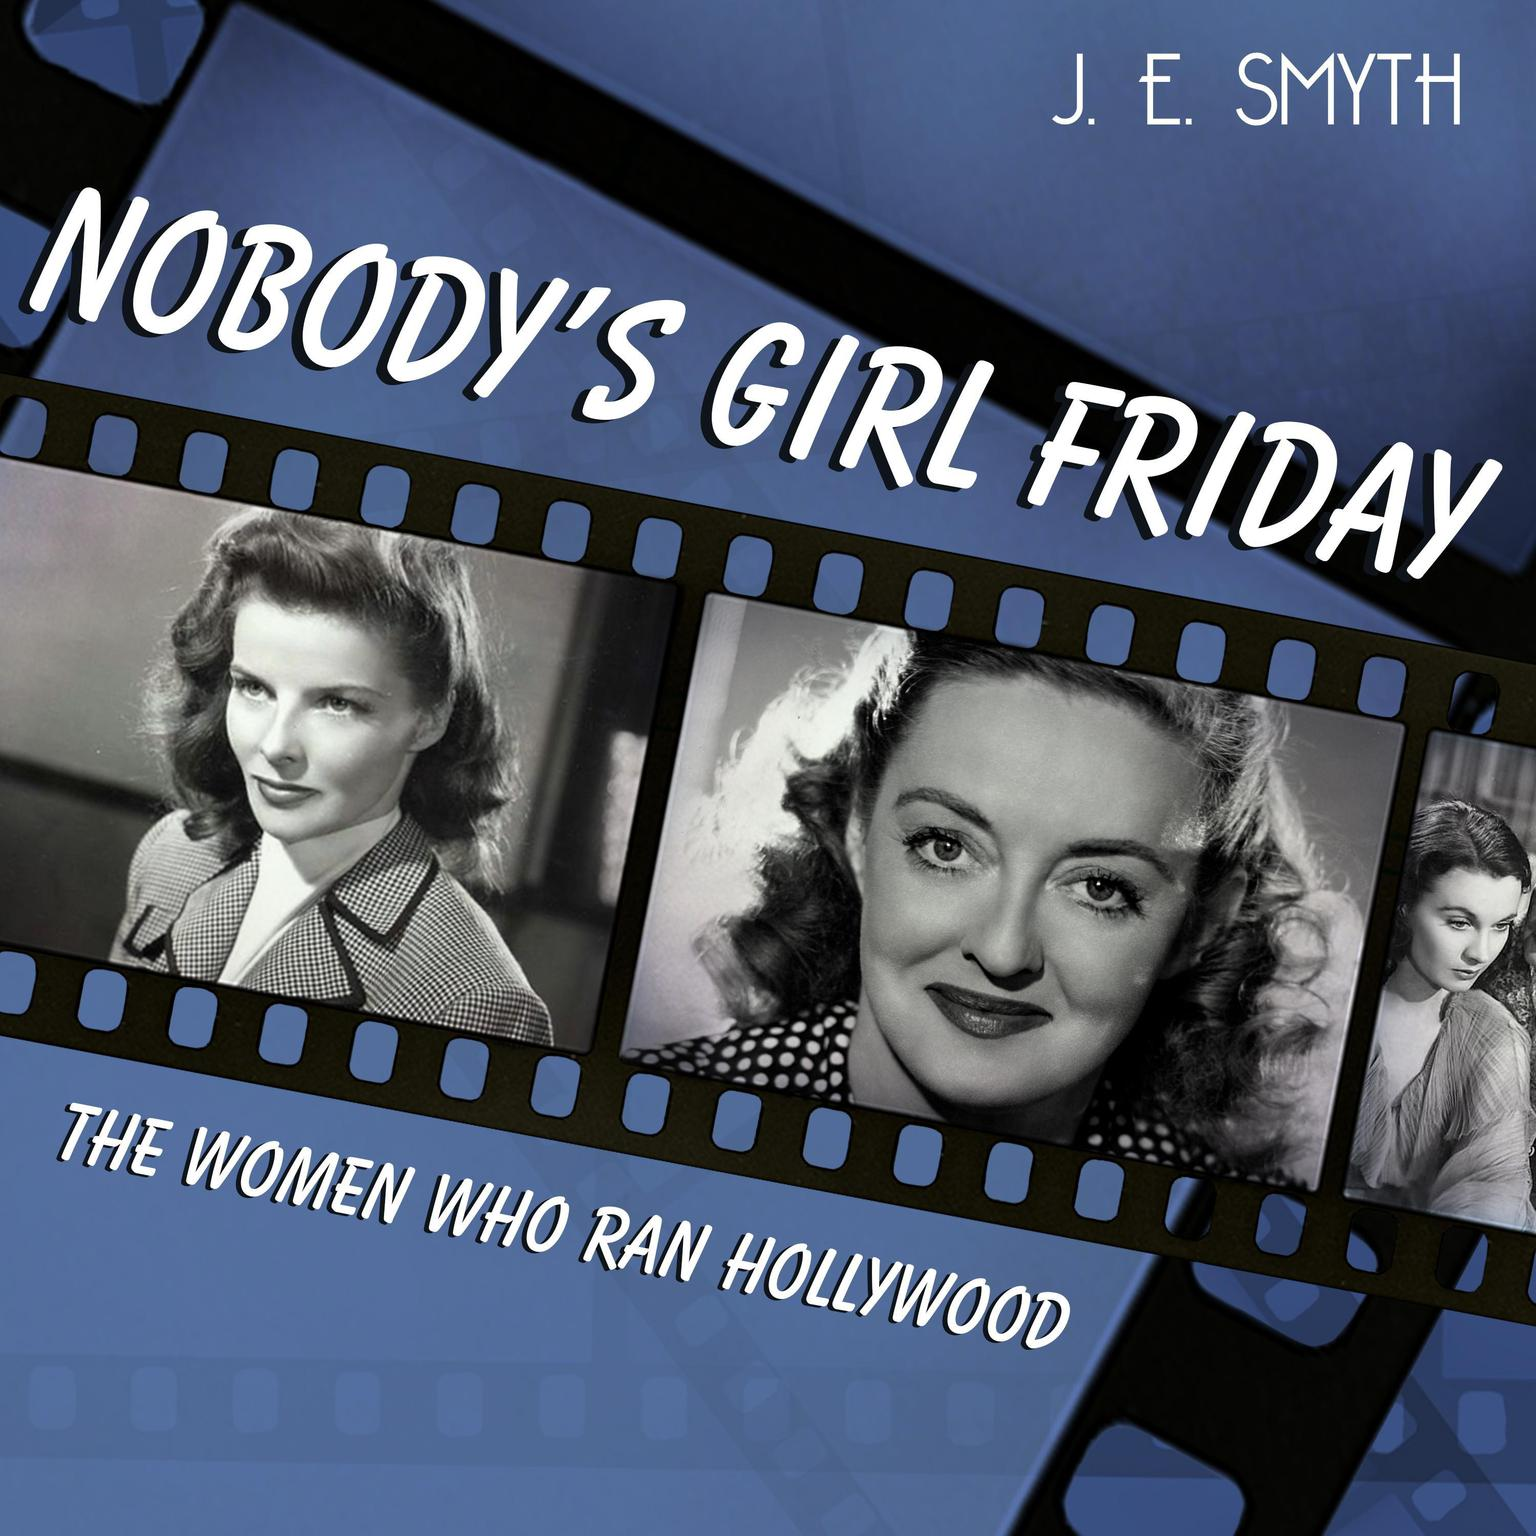 Nobodys Girl Friday: The Women Who Ran Hollywood Audiobook, by J. E. Smyth